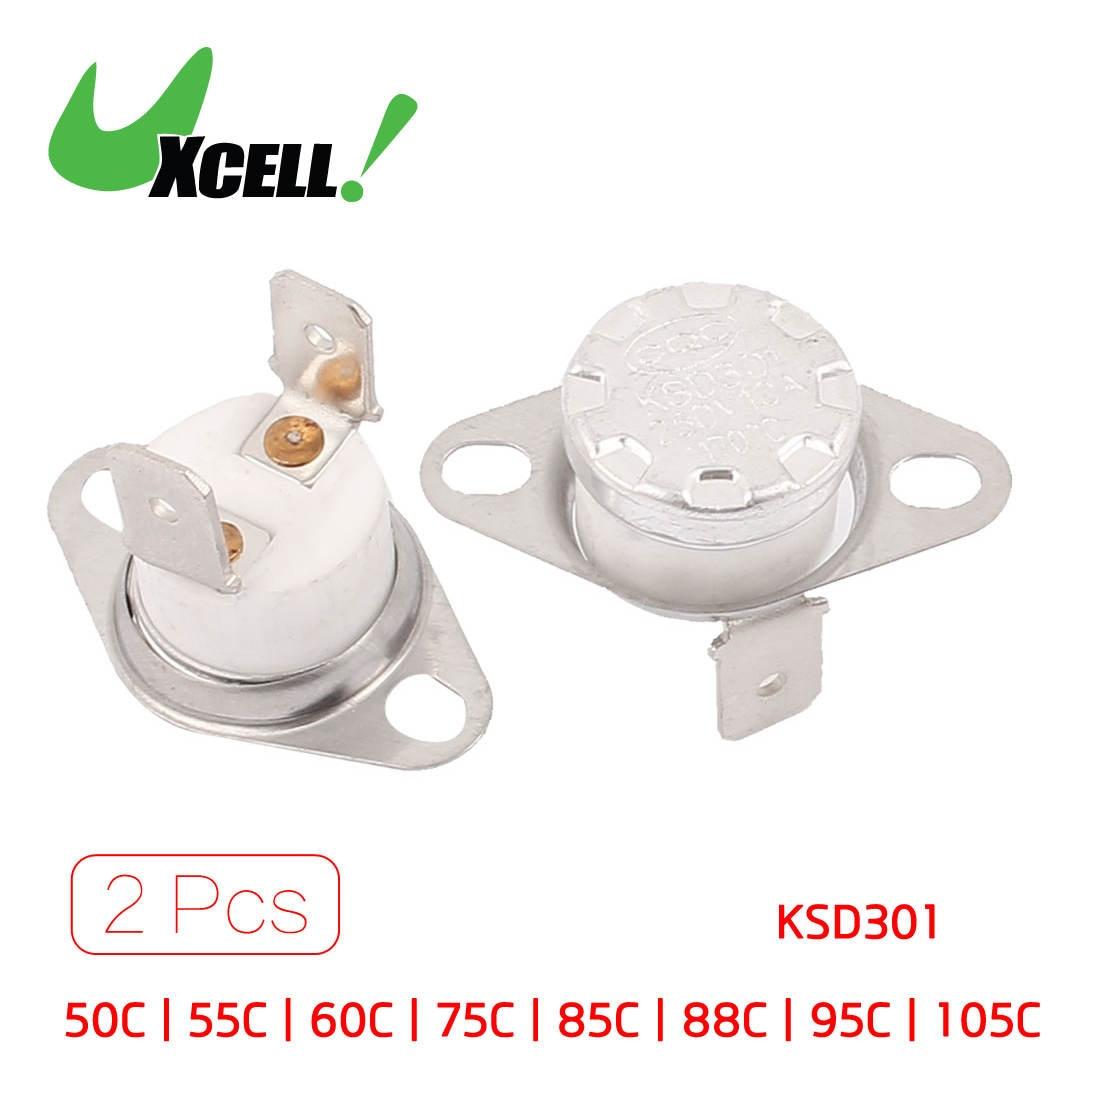 Uxcell 2 предмета NC 2 Булавки Контроль температуры Керамика термостат Swtich AC250V 105C  110c  115c  120c  125C  170C  175c  50C ...